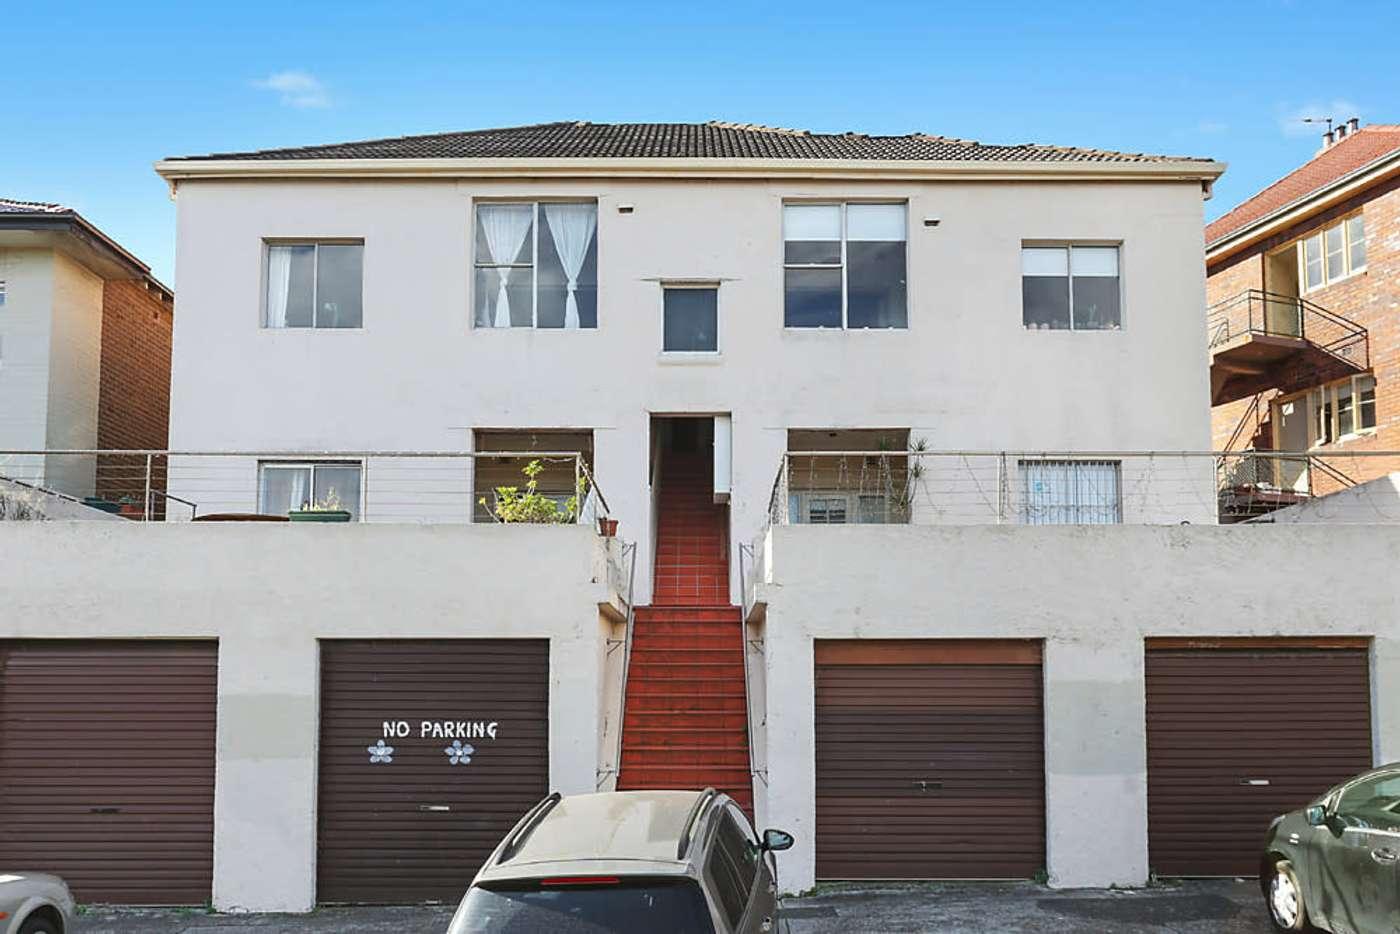 Main view of Homely blockOfUnits listing, 1-4 96 Warners Avenue, Bondi Beach NSW 2026